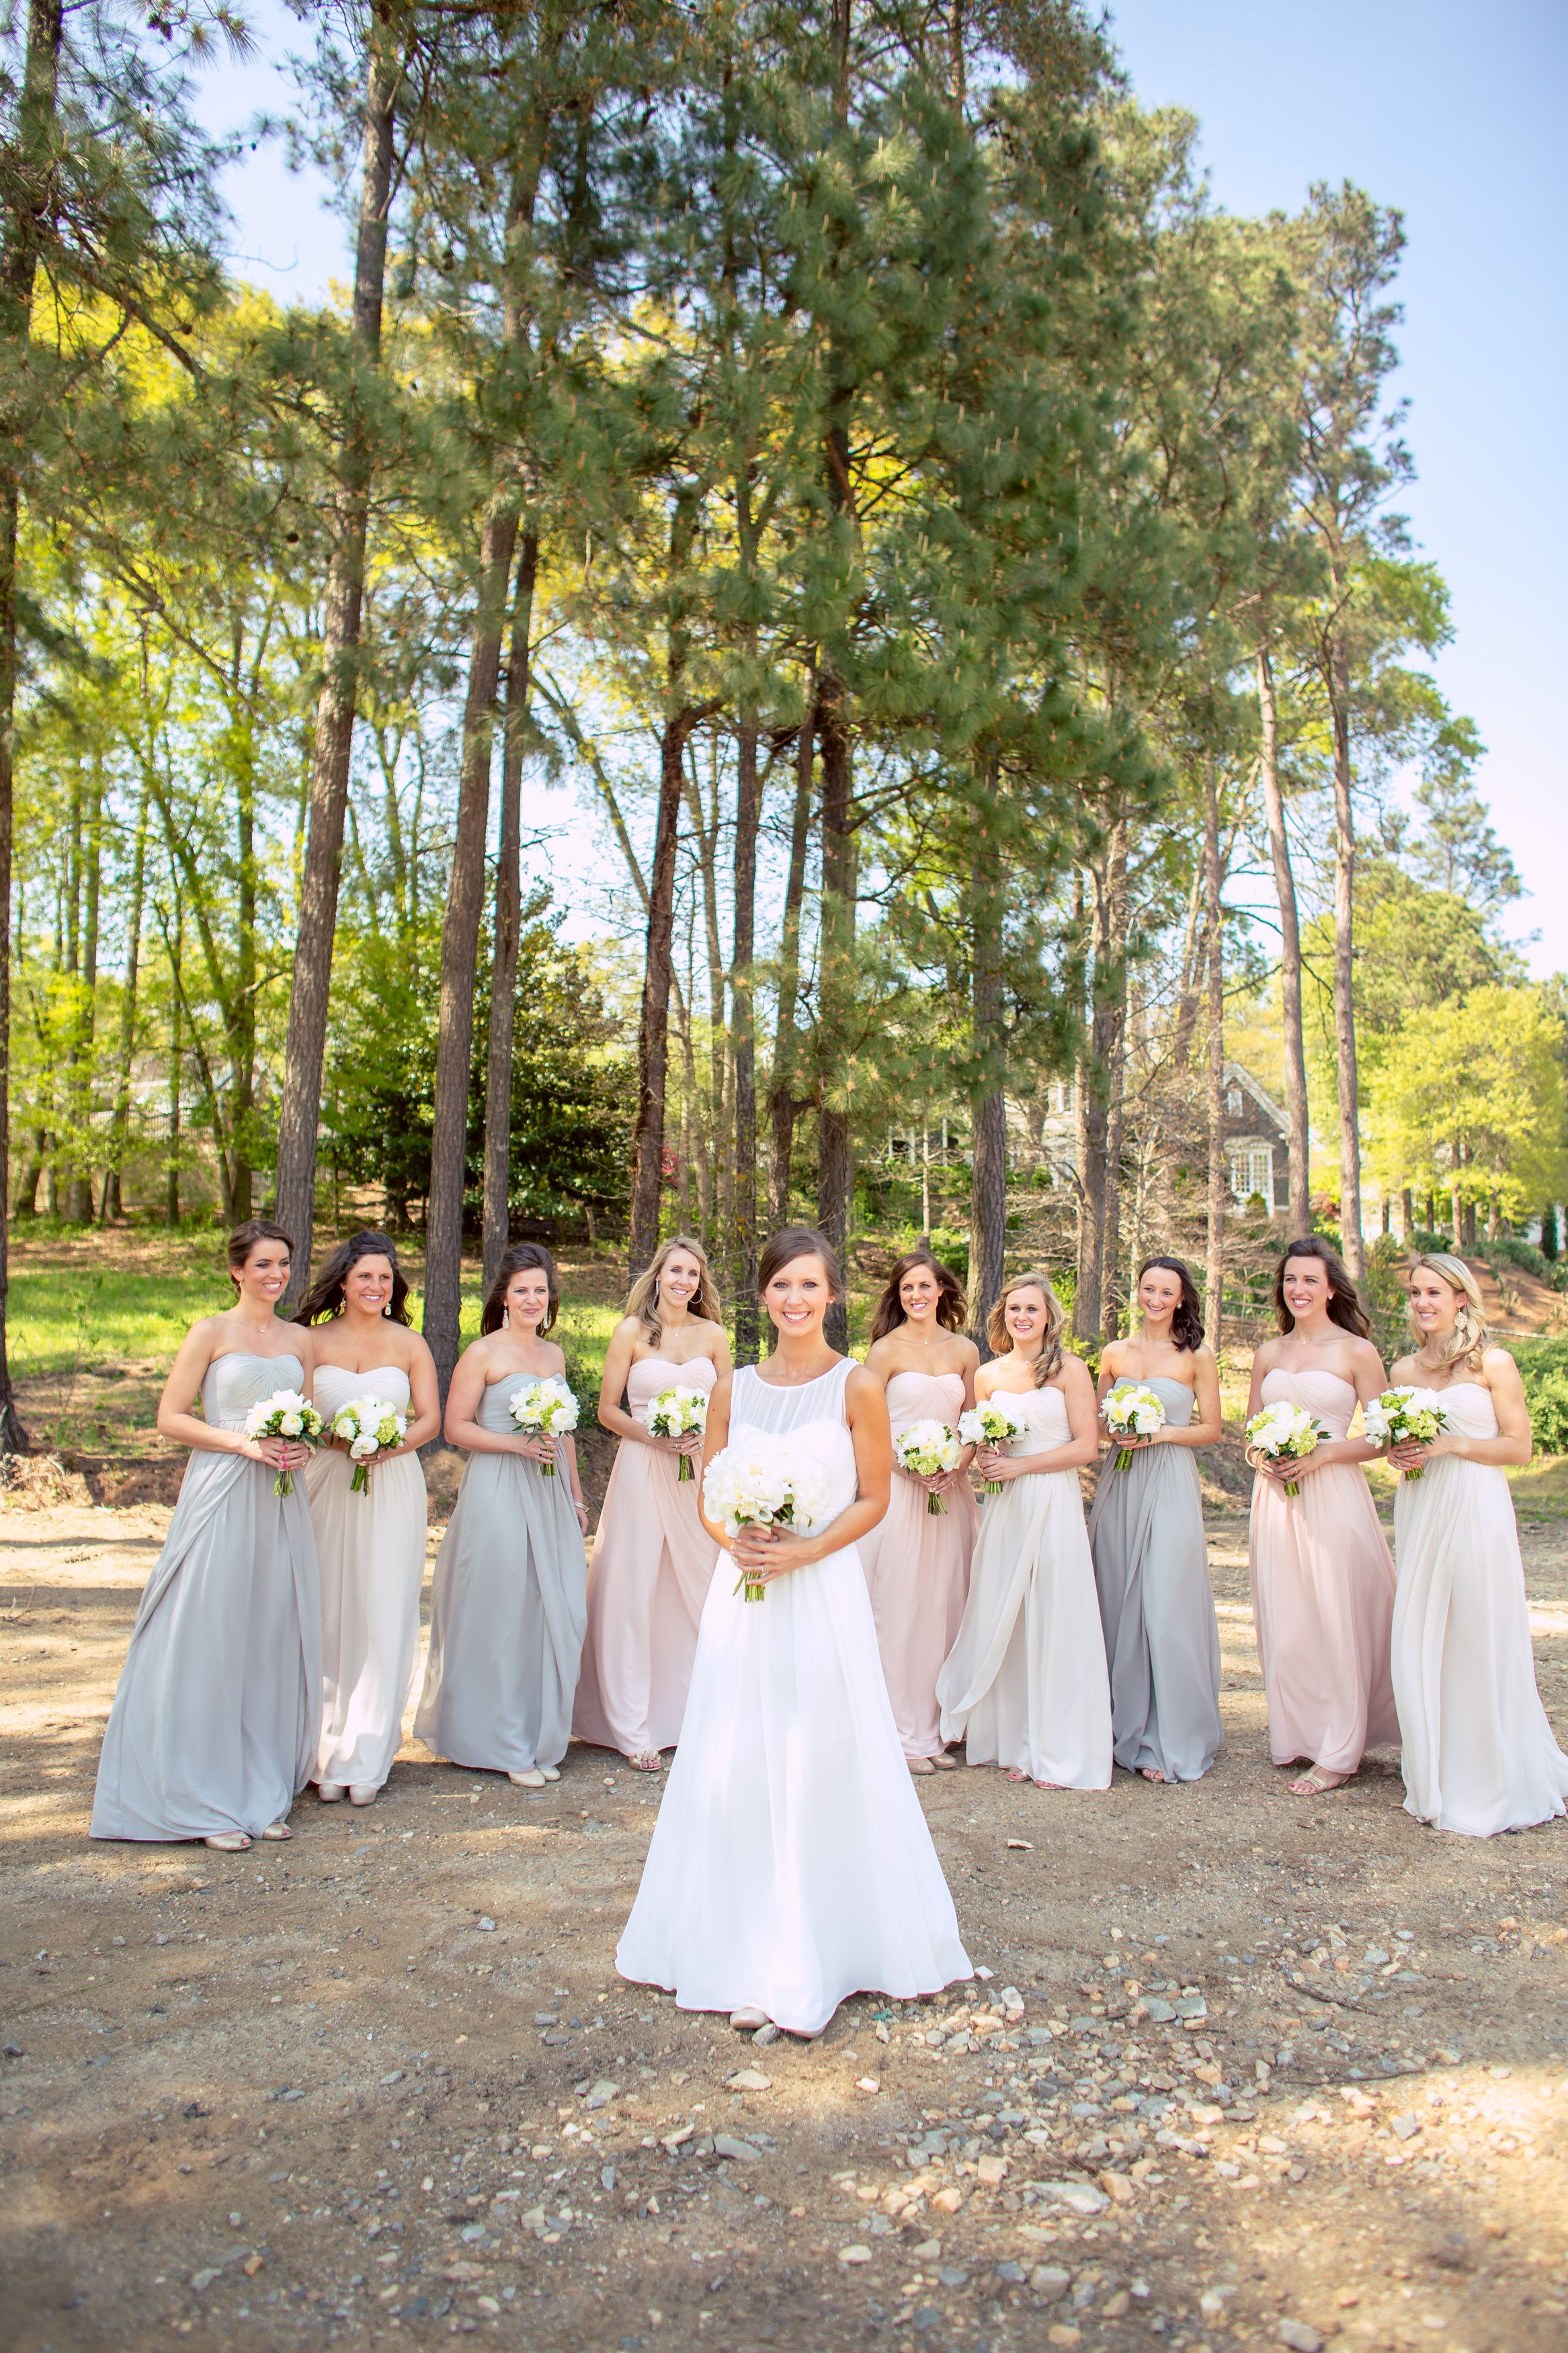 Jenny yoo vivienne bridal gown jenny yoo aidan bridesmaids jenny yoo vivienne bridal gown jenny yoo aidan bridesmaids dresses in ombrellifo Choice Image